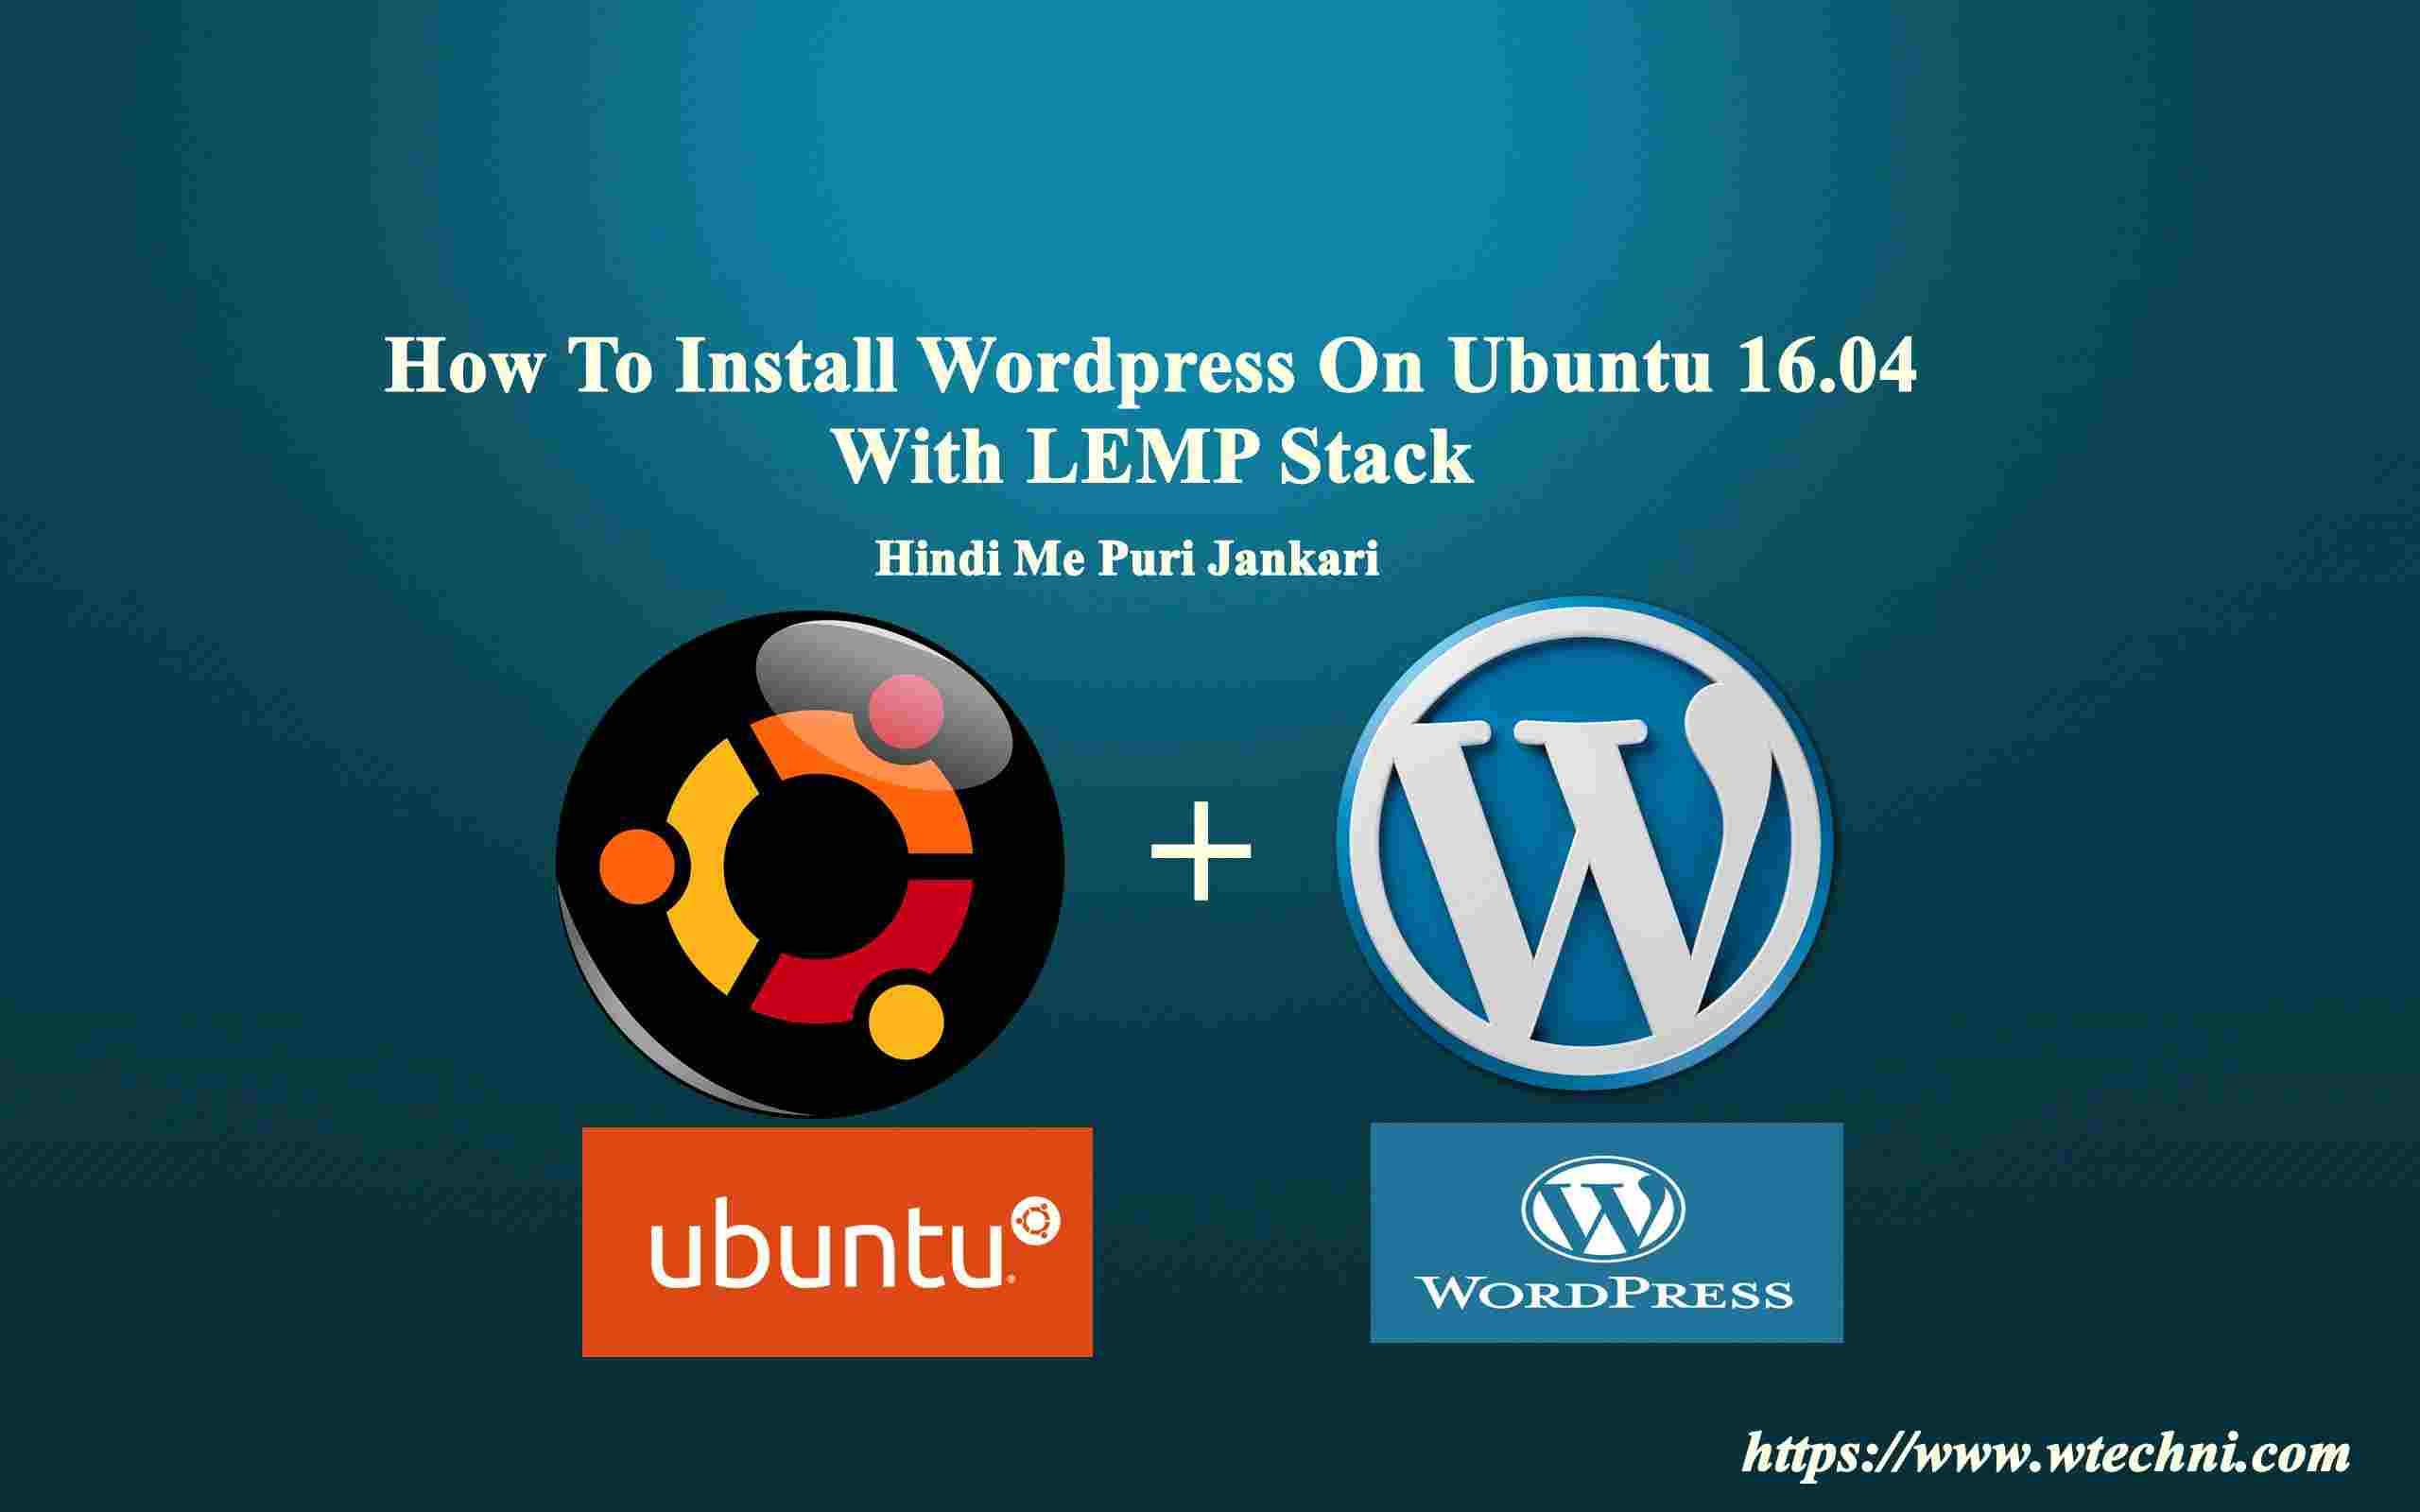 wordpress install on ubuntu with LEMP stack